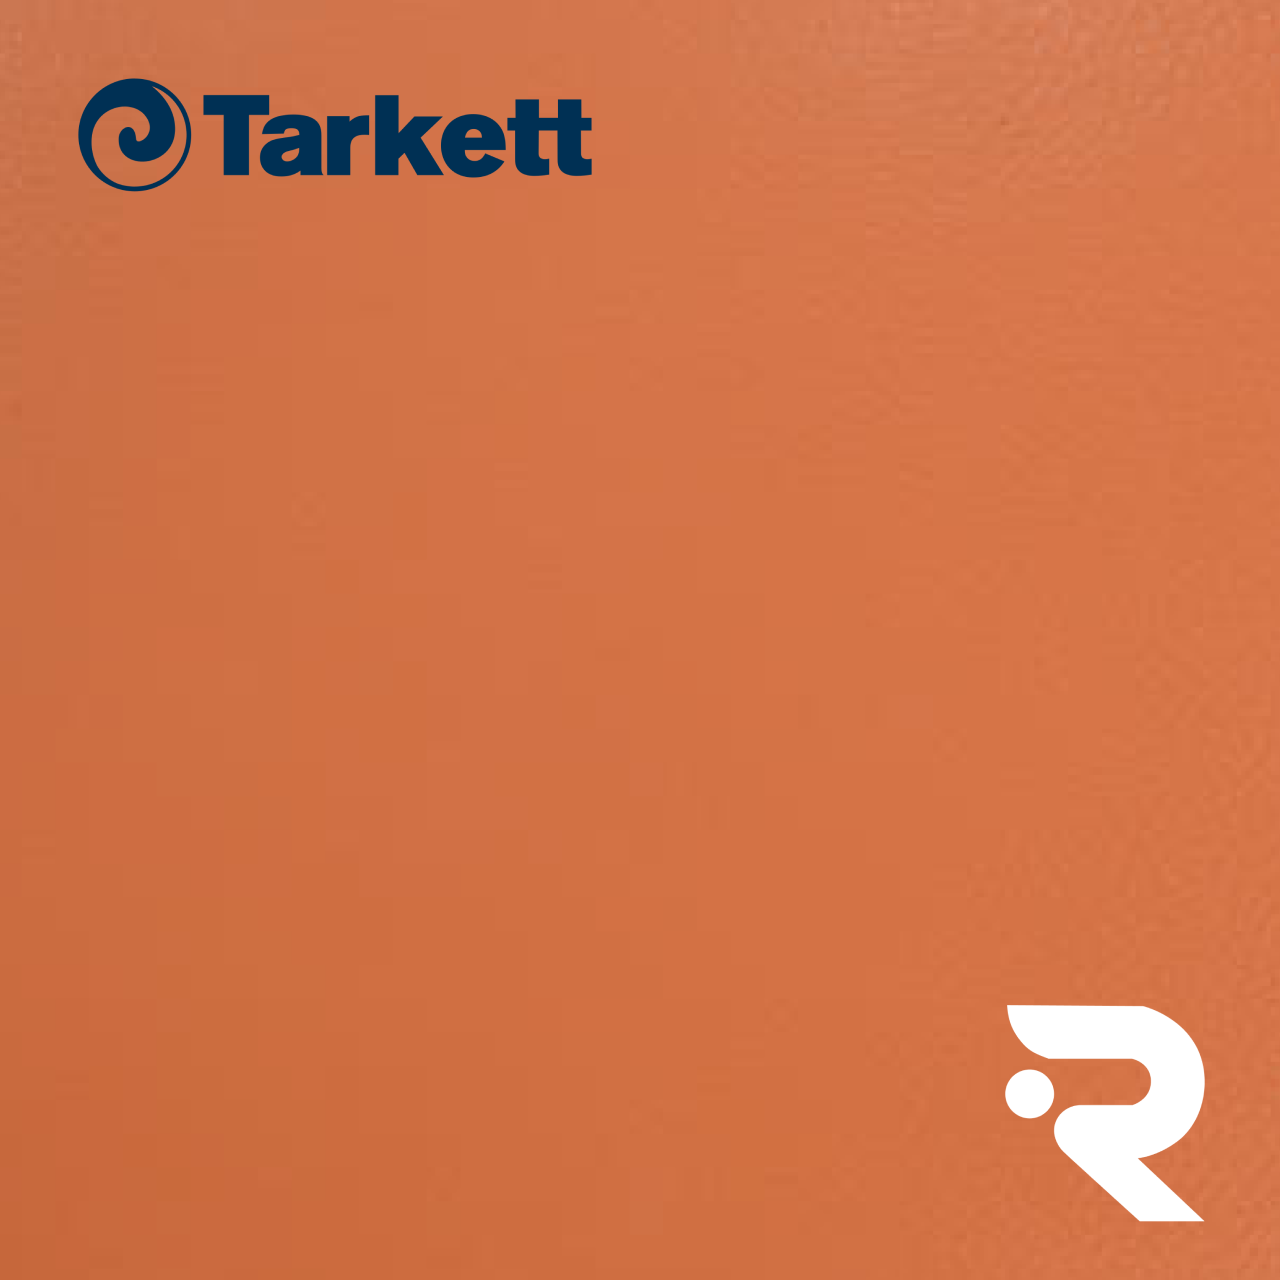 🏐 Спортивное покрытие Tarkett | ORANGE | OMNISPORTS V35 | 2 х 20.5 м